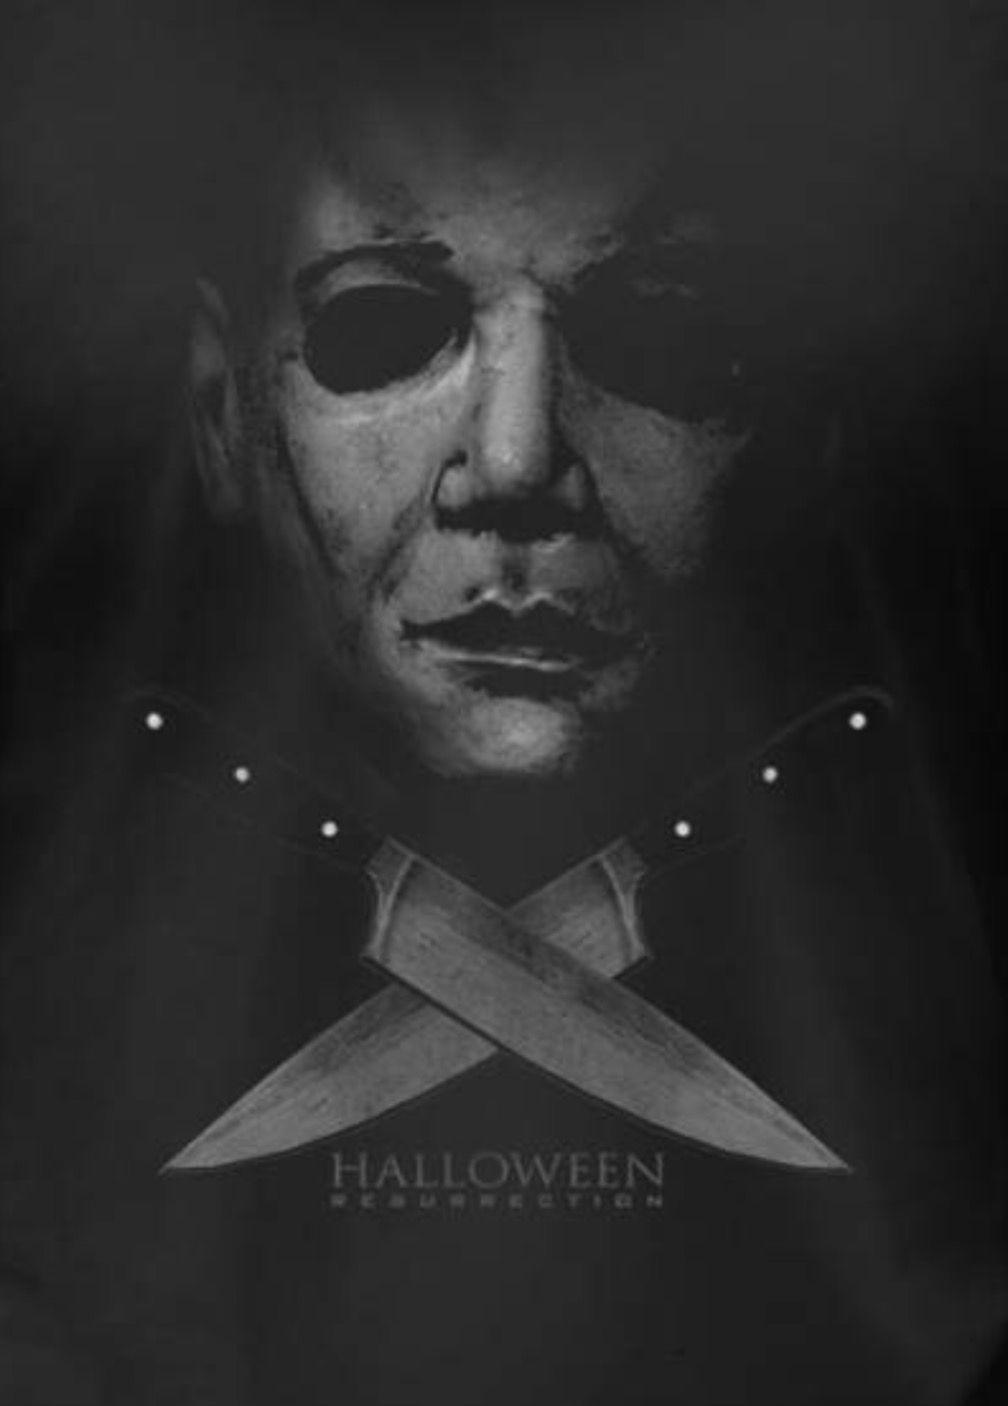 Halloween Michael Myers Mask | Nerd Stuff That I'll Have Someday ...